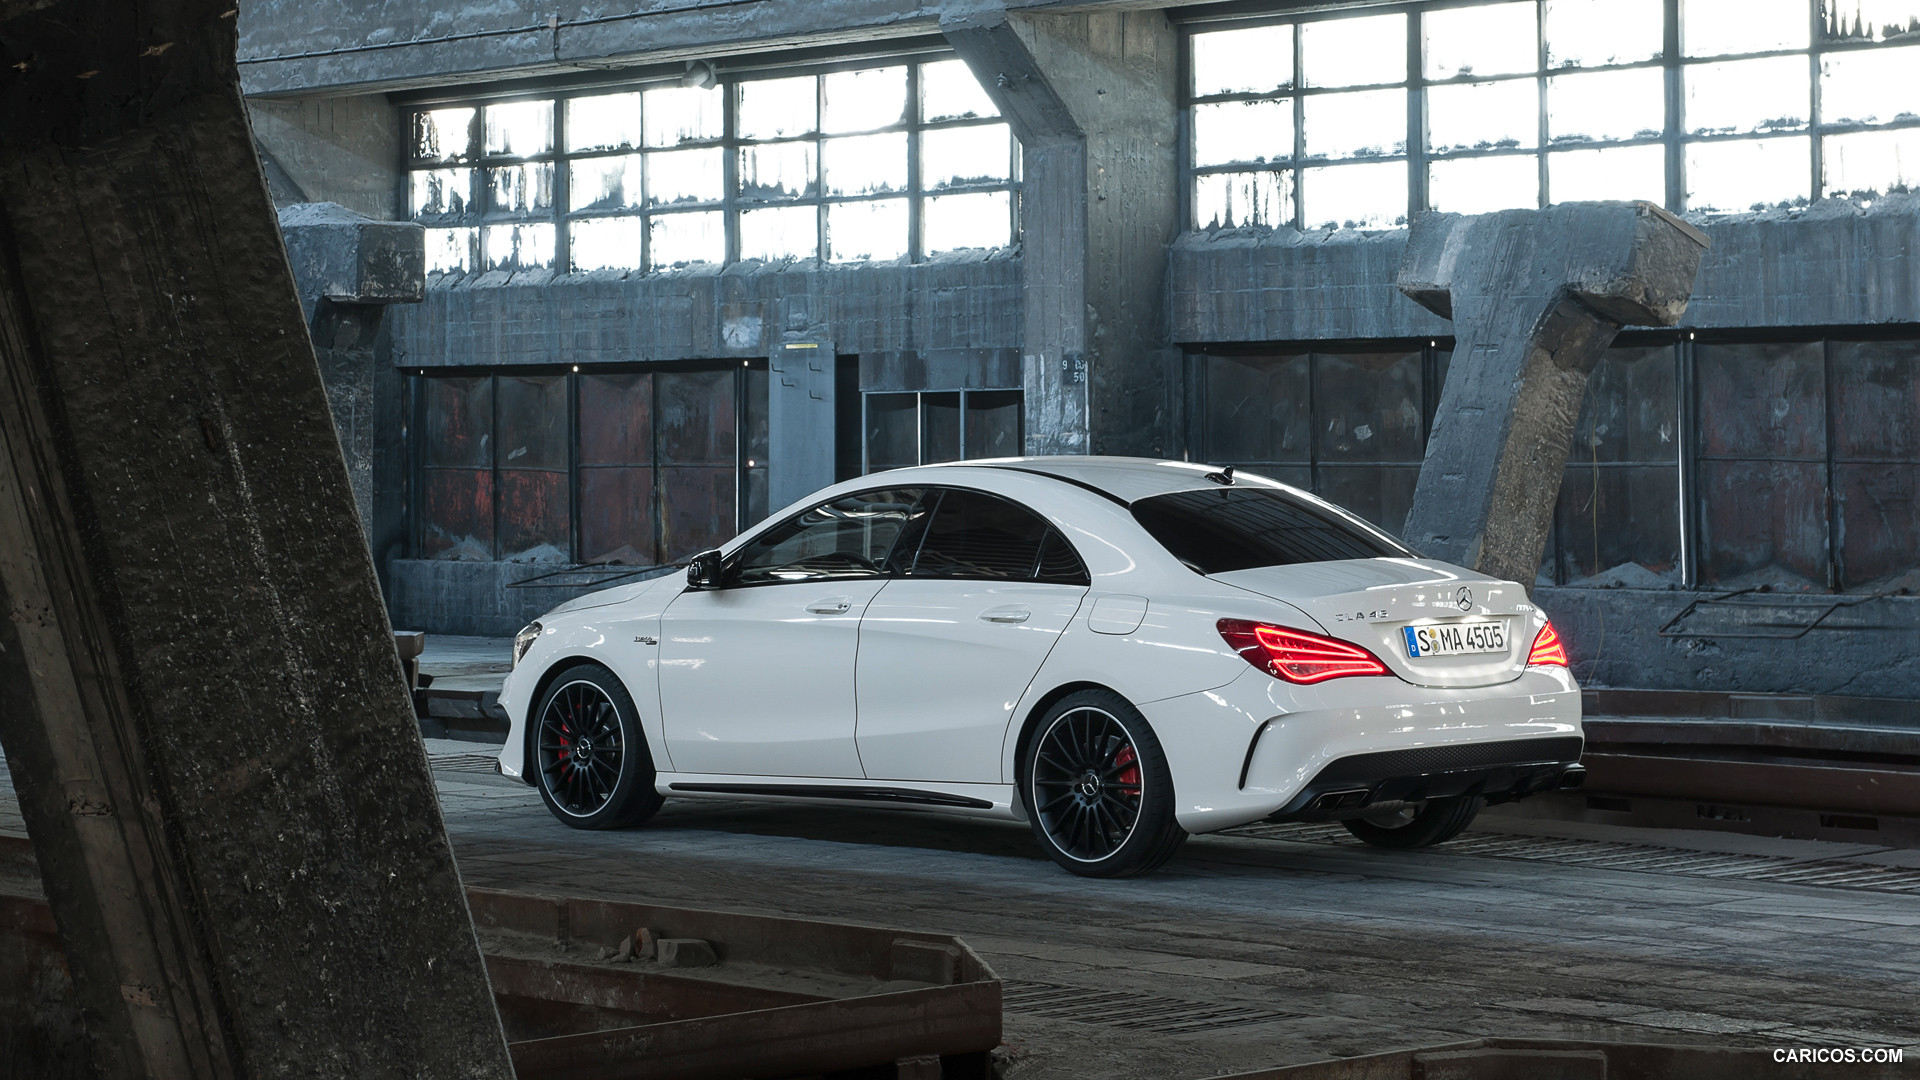 Mercedes Benz Cla Amg Mp Pic